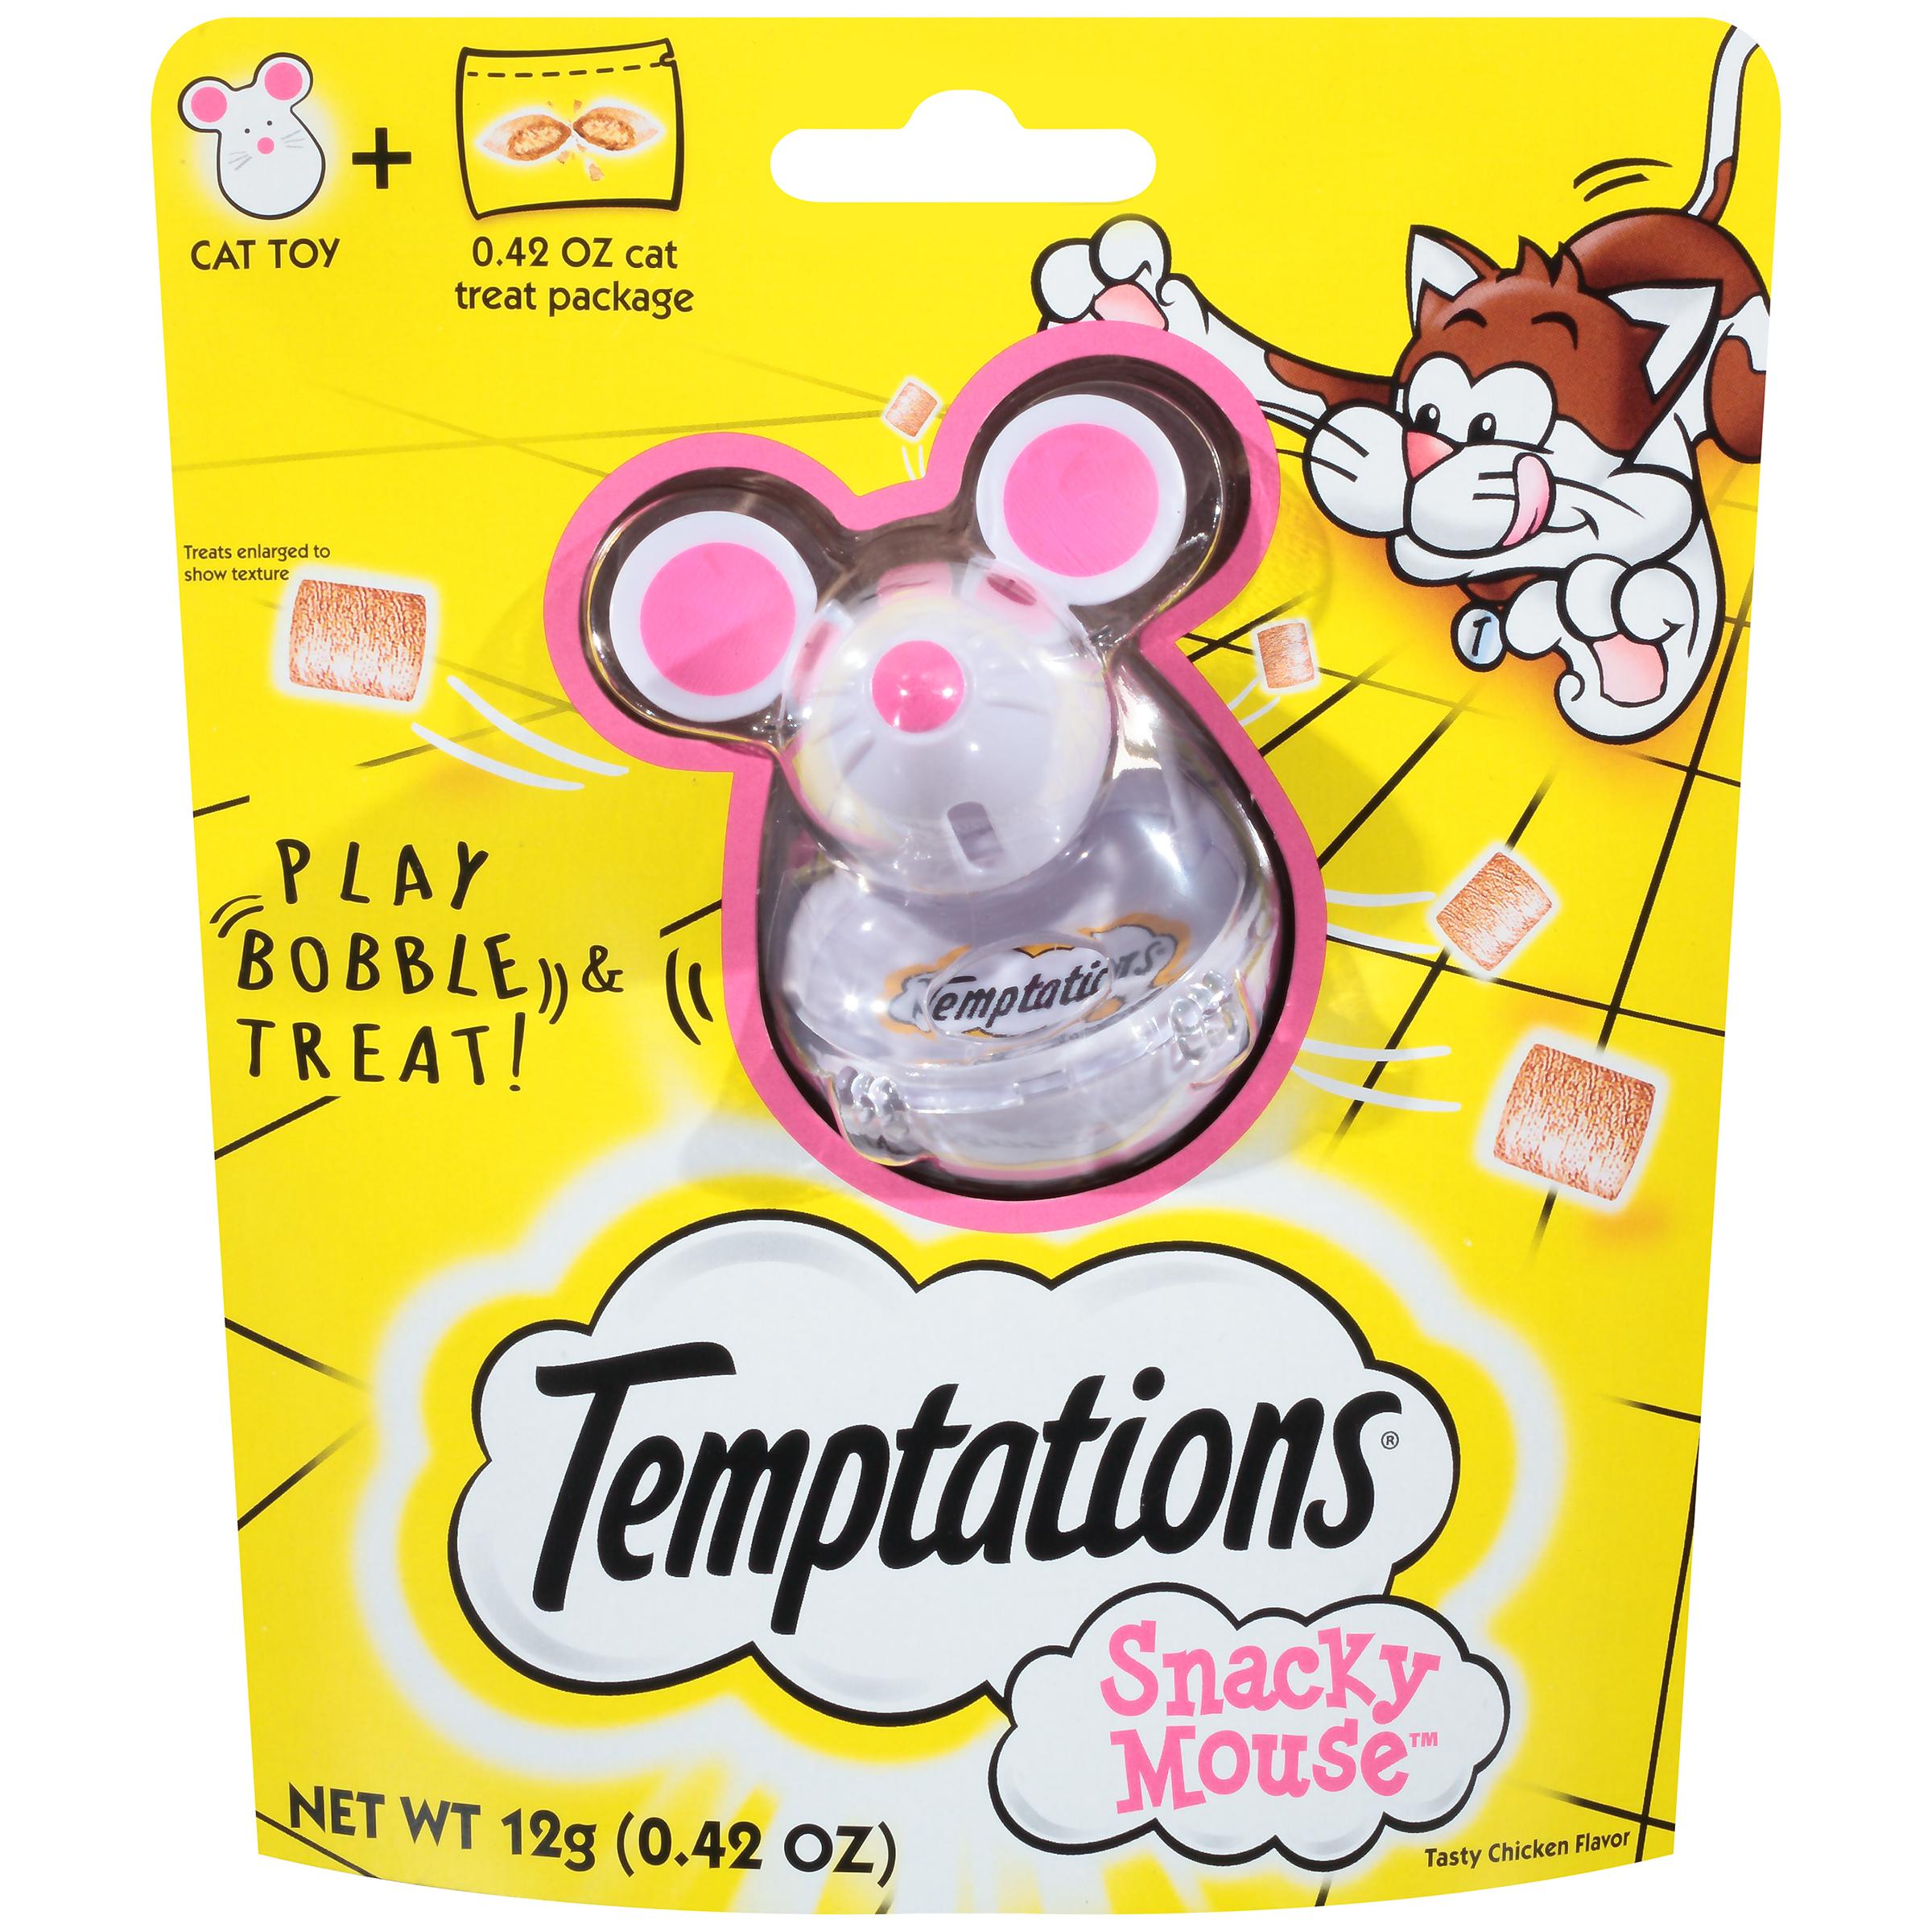 Temptations® Snacky Mouse™ Cat Treat Kit